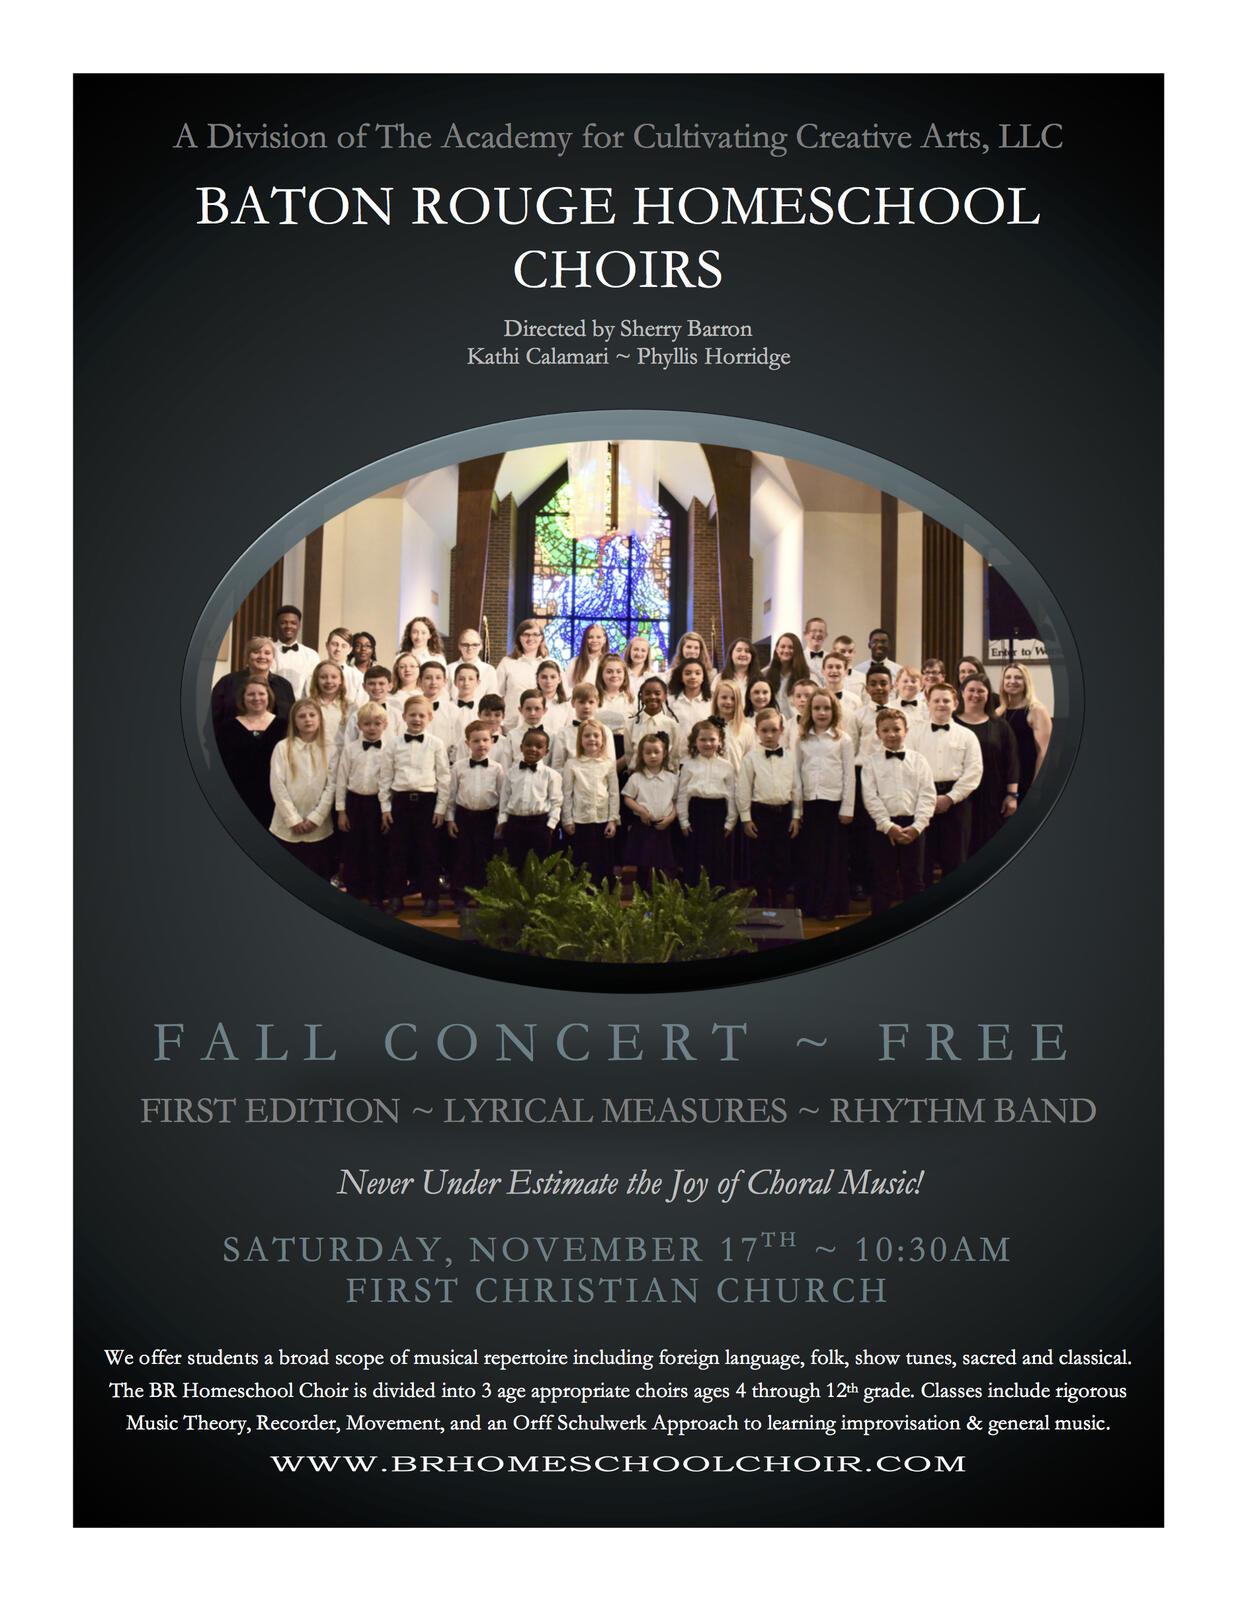 Nov 17 · The Baton Rouge Homeschool Choir Fall Concert